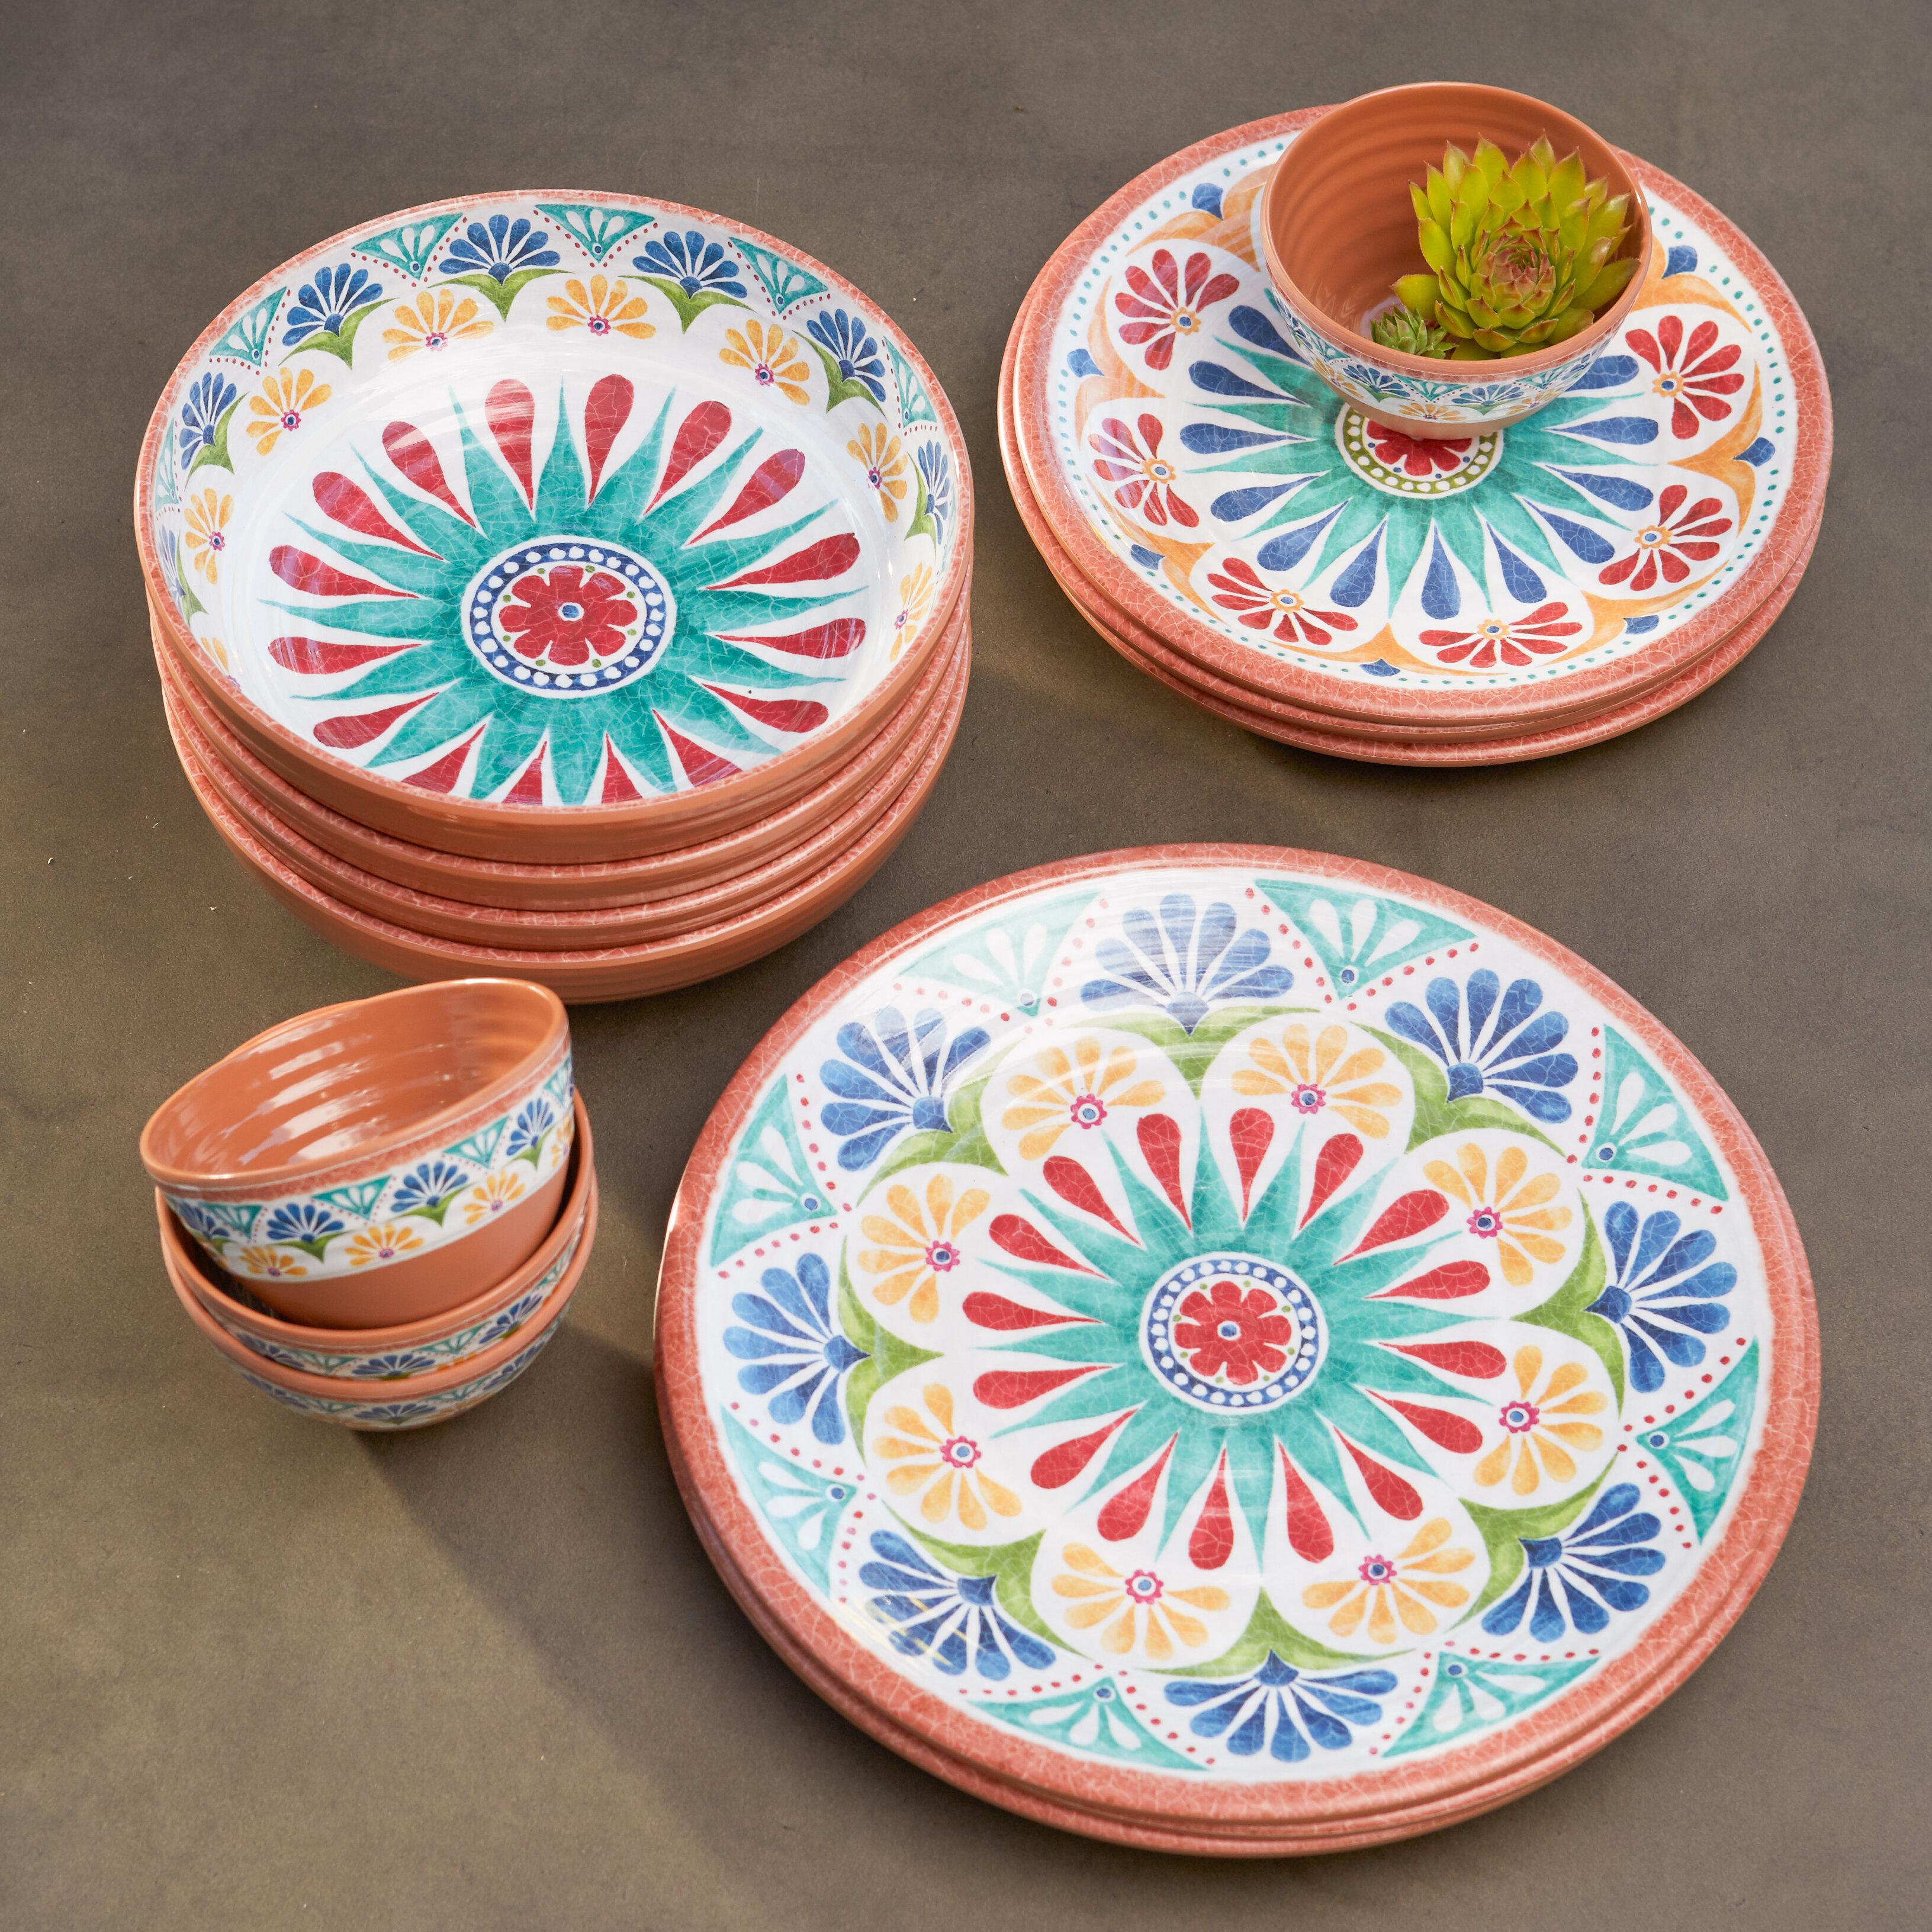 Charmant Bungalow Rose Adah 16 Piece Melamine Dinnerware Set, Service For 16 U0026  Reviews | Wayfair